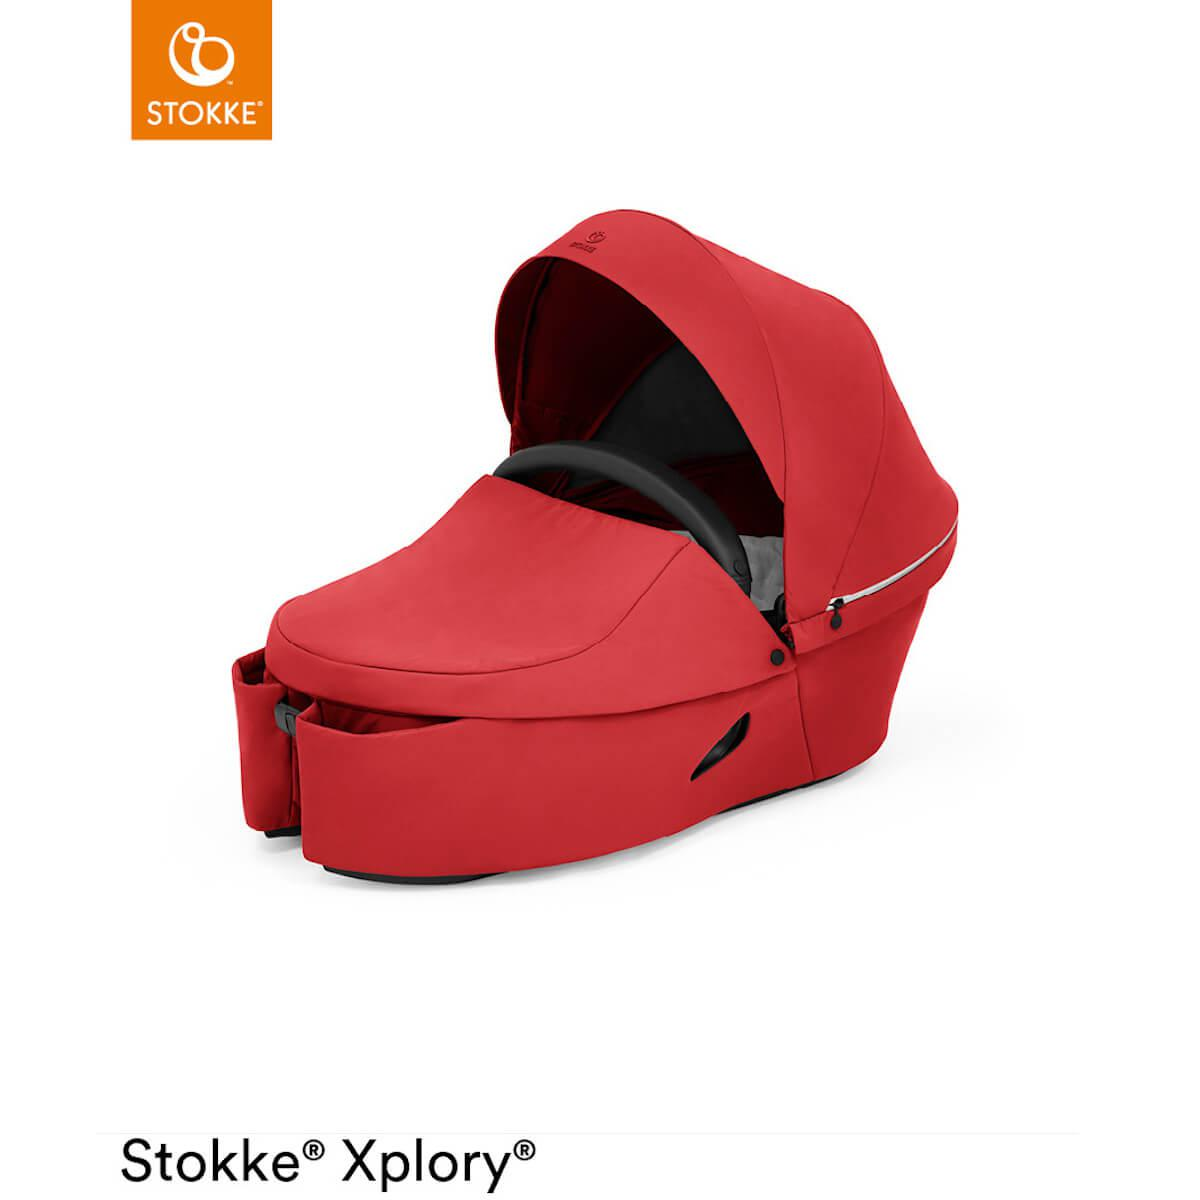 Babyschale XPLORY X Stokke Ruby Red